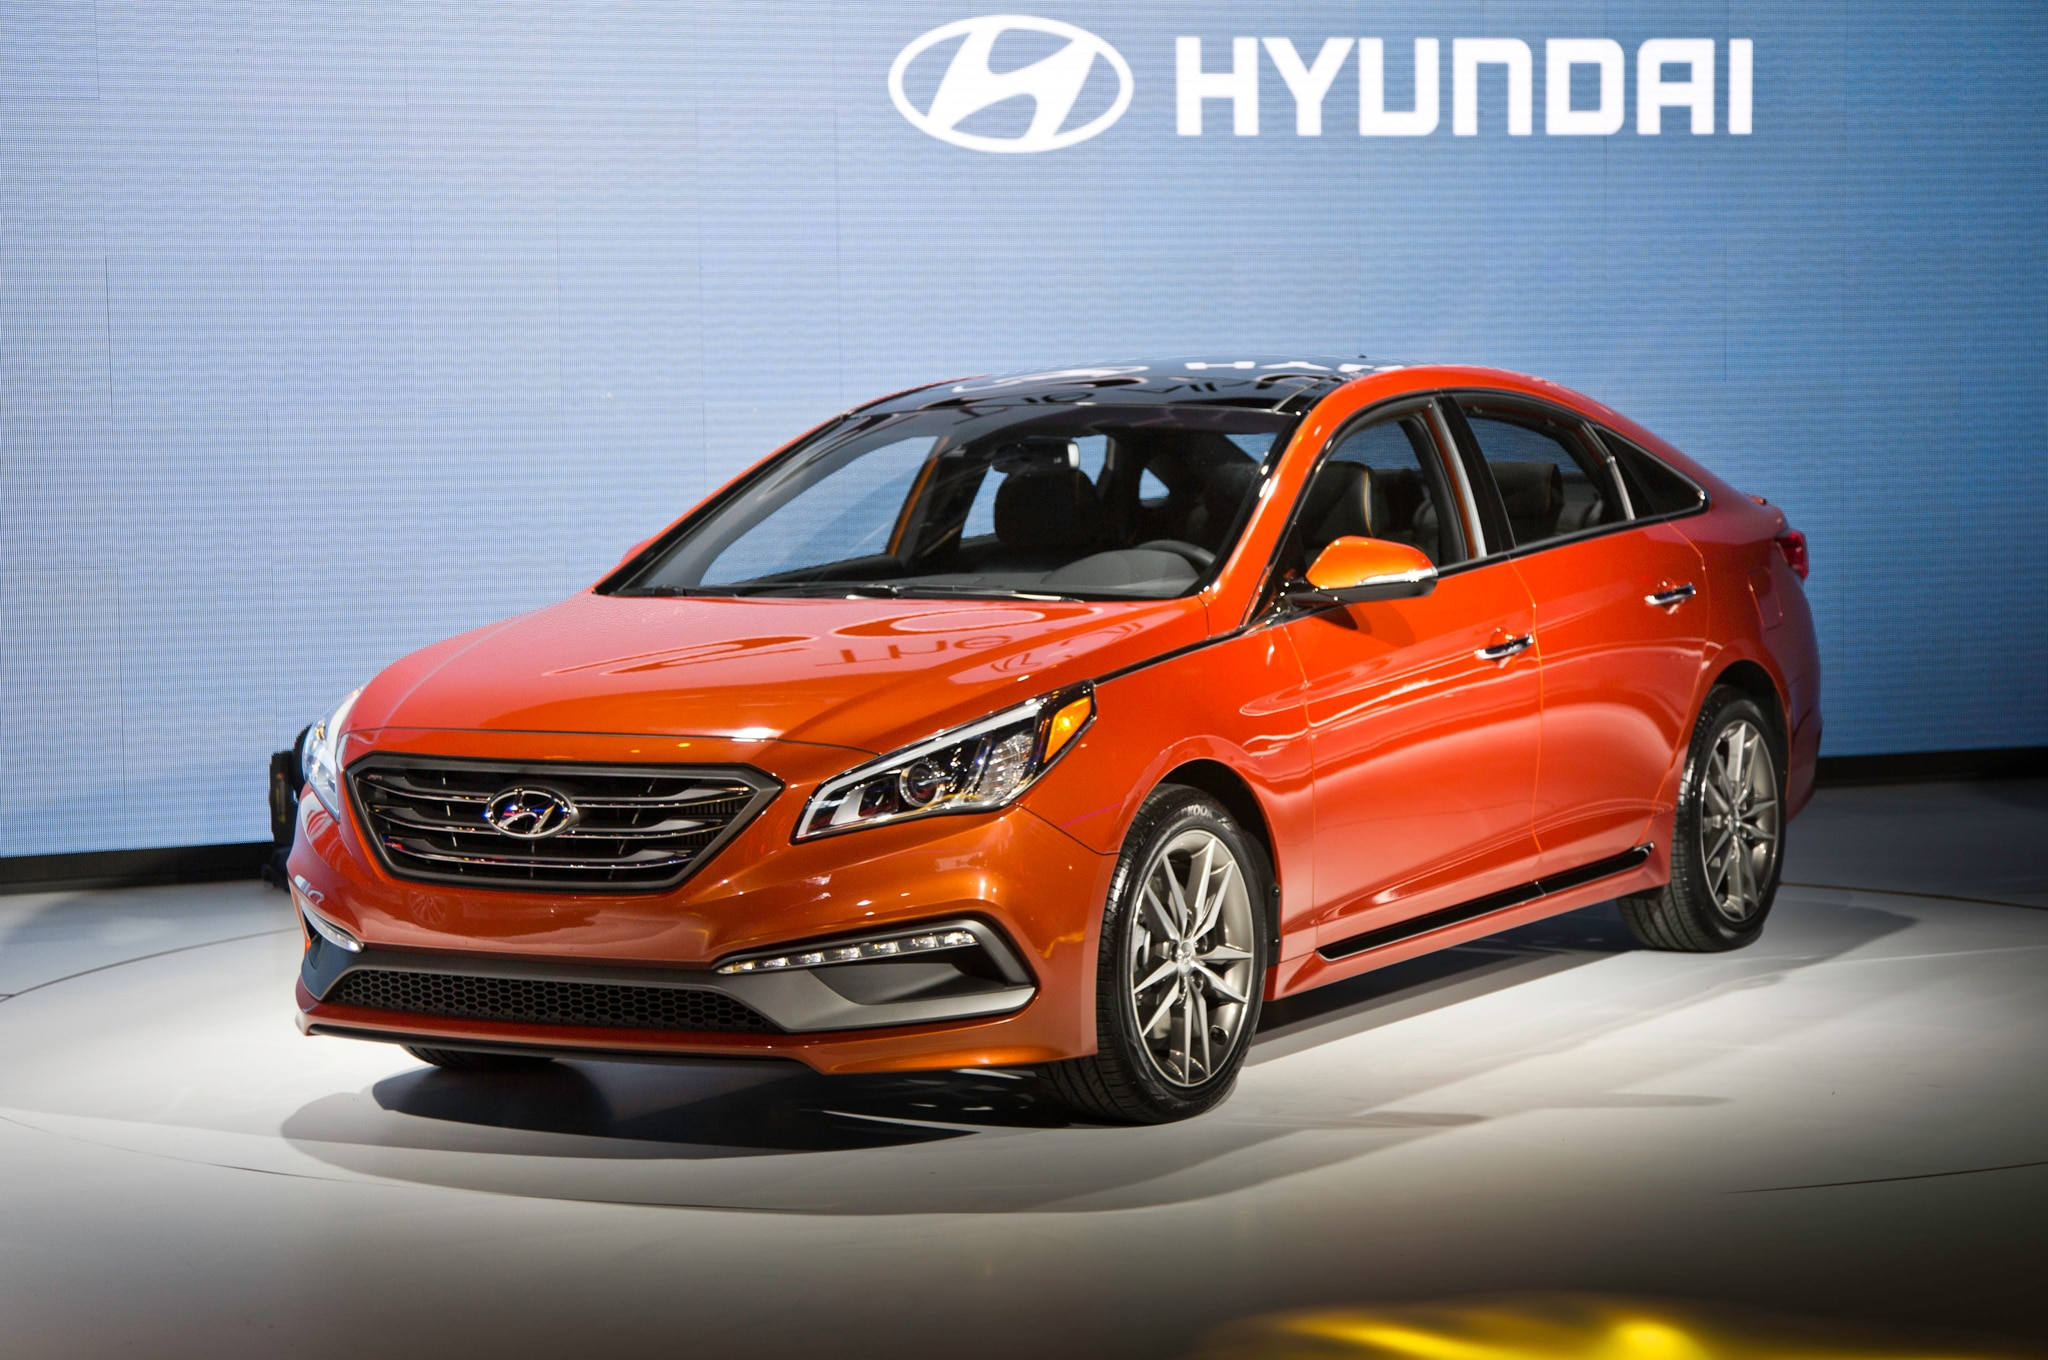 2015 Hyundai Sonata Sport 20T Front There Quarters 031